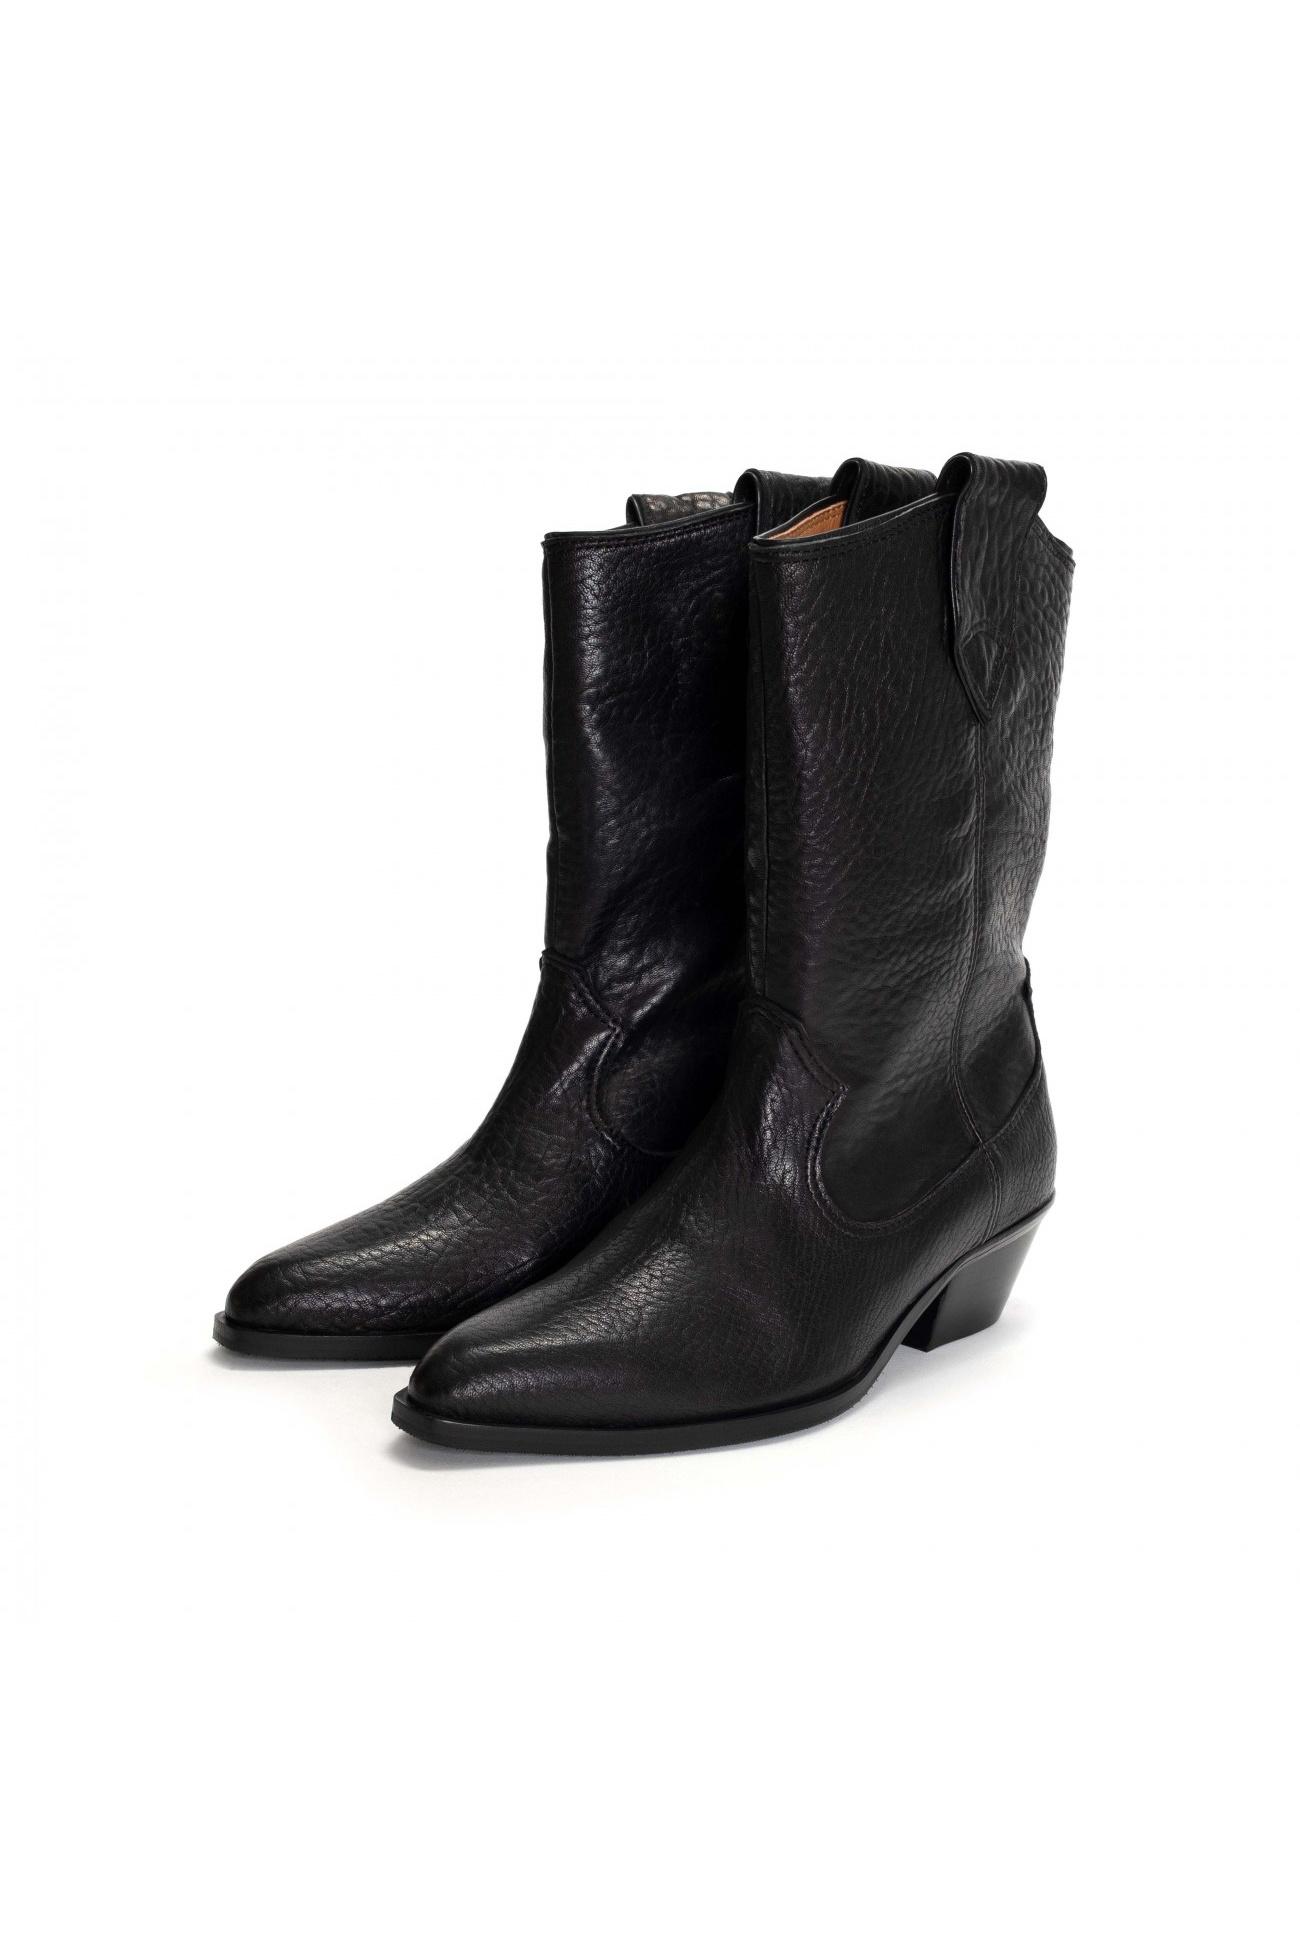 Saseline 35 Heavy Grain Calf Boot - Black-2